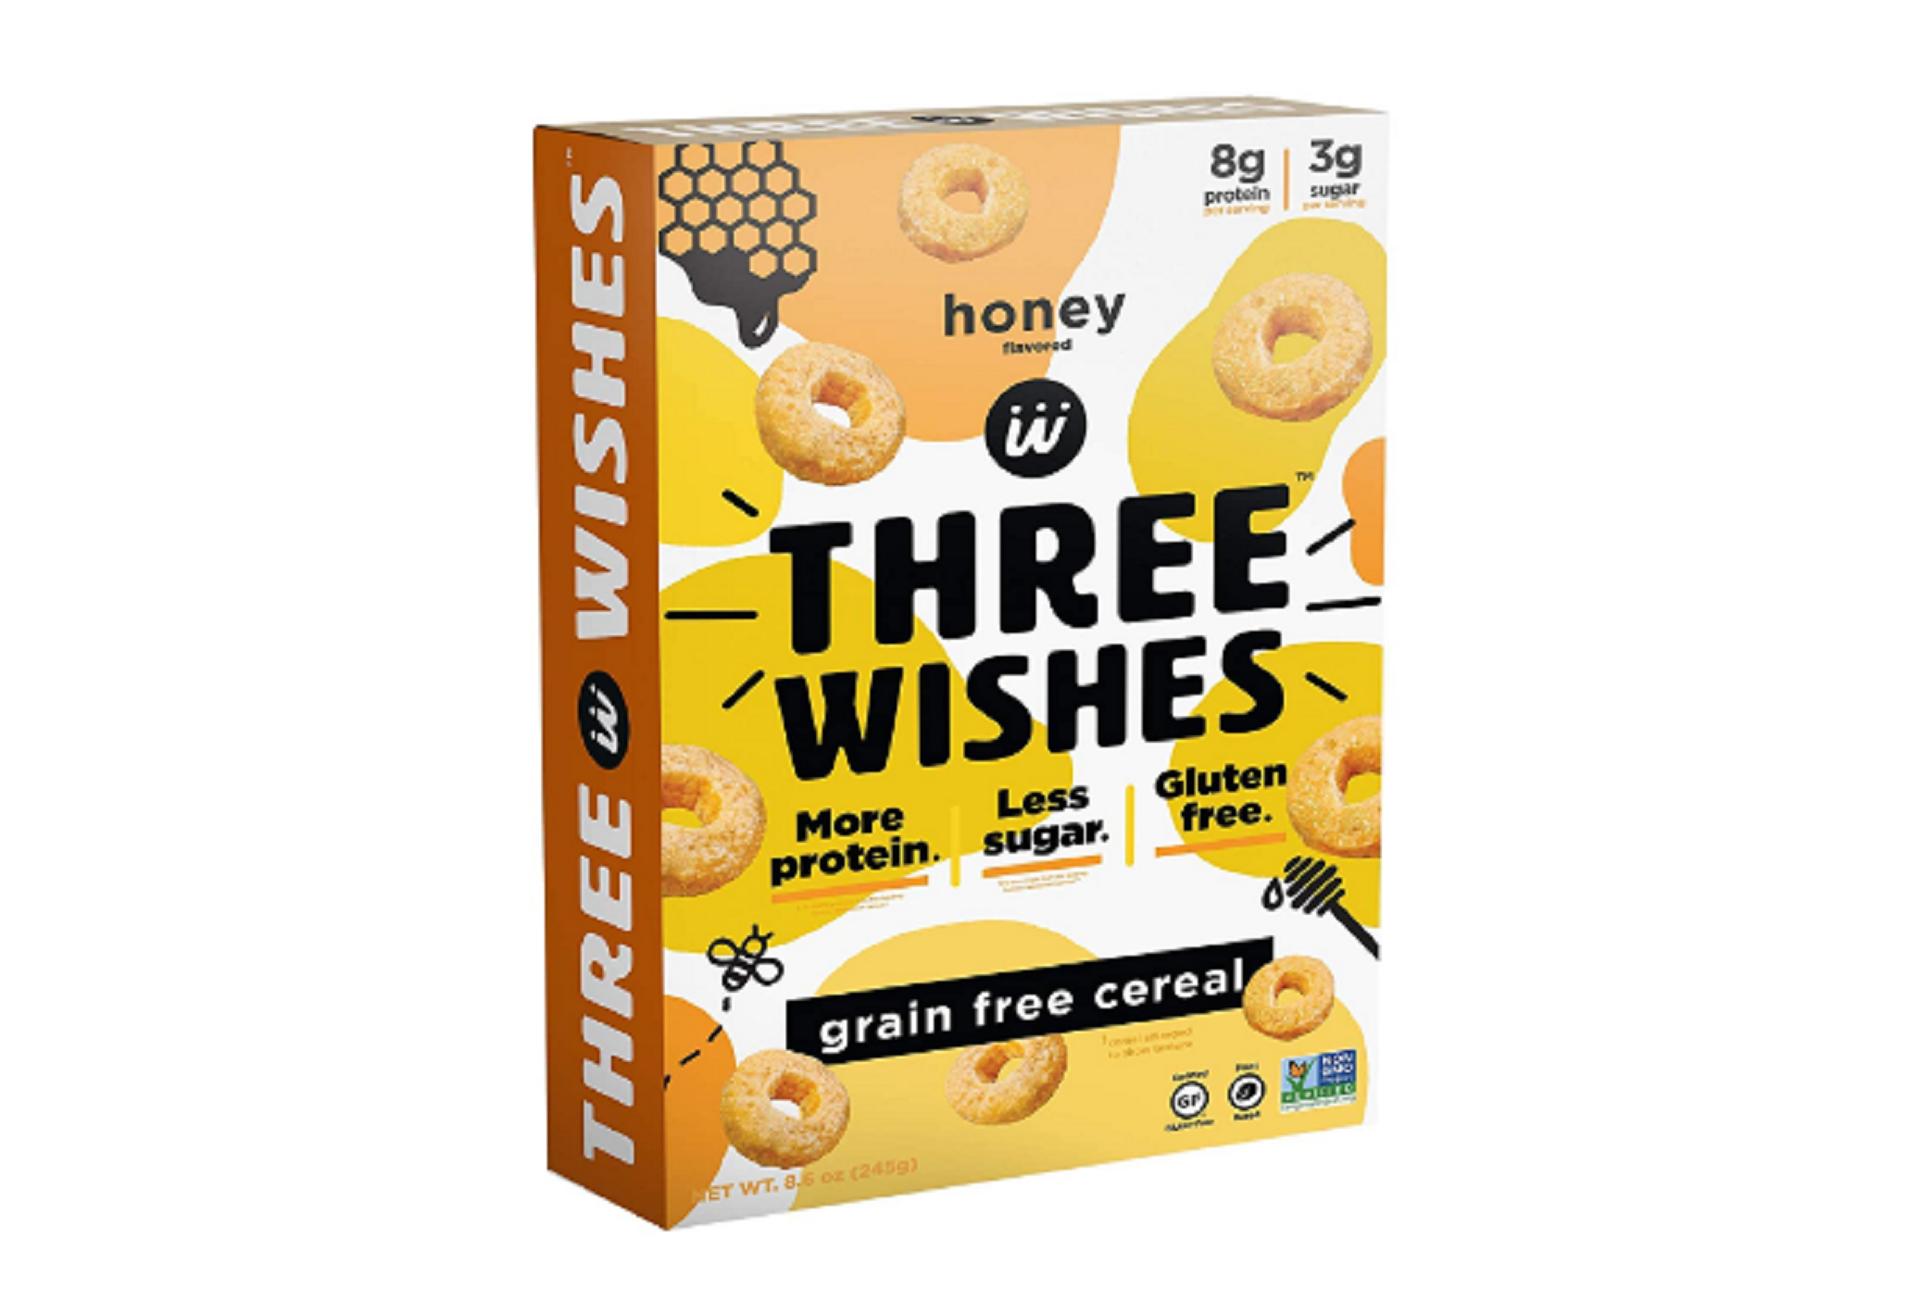 three wishes vegan cereal brand